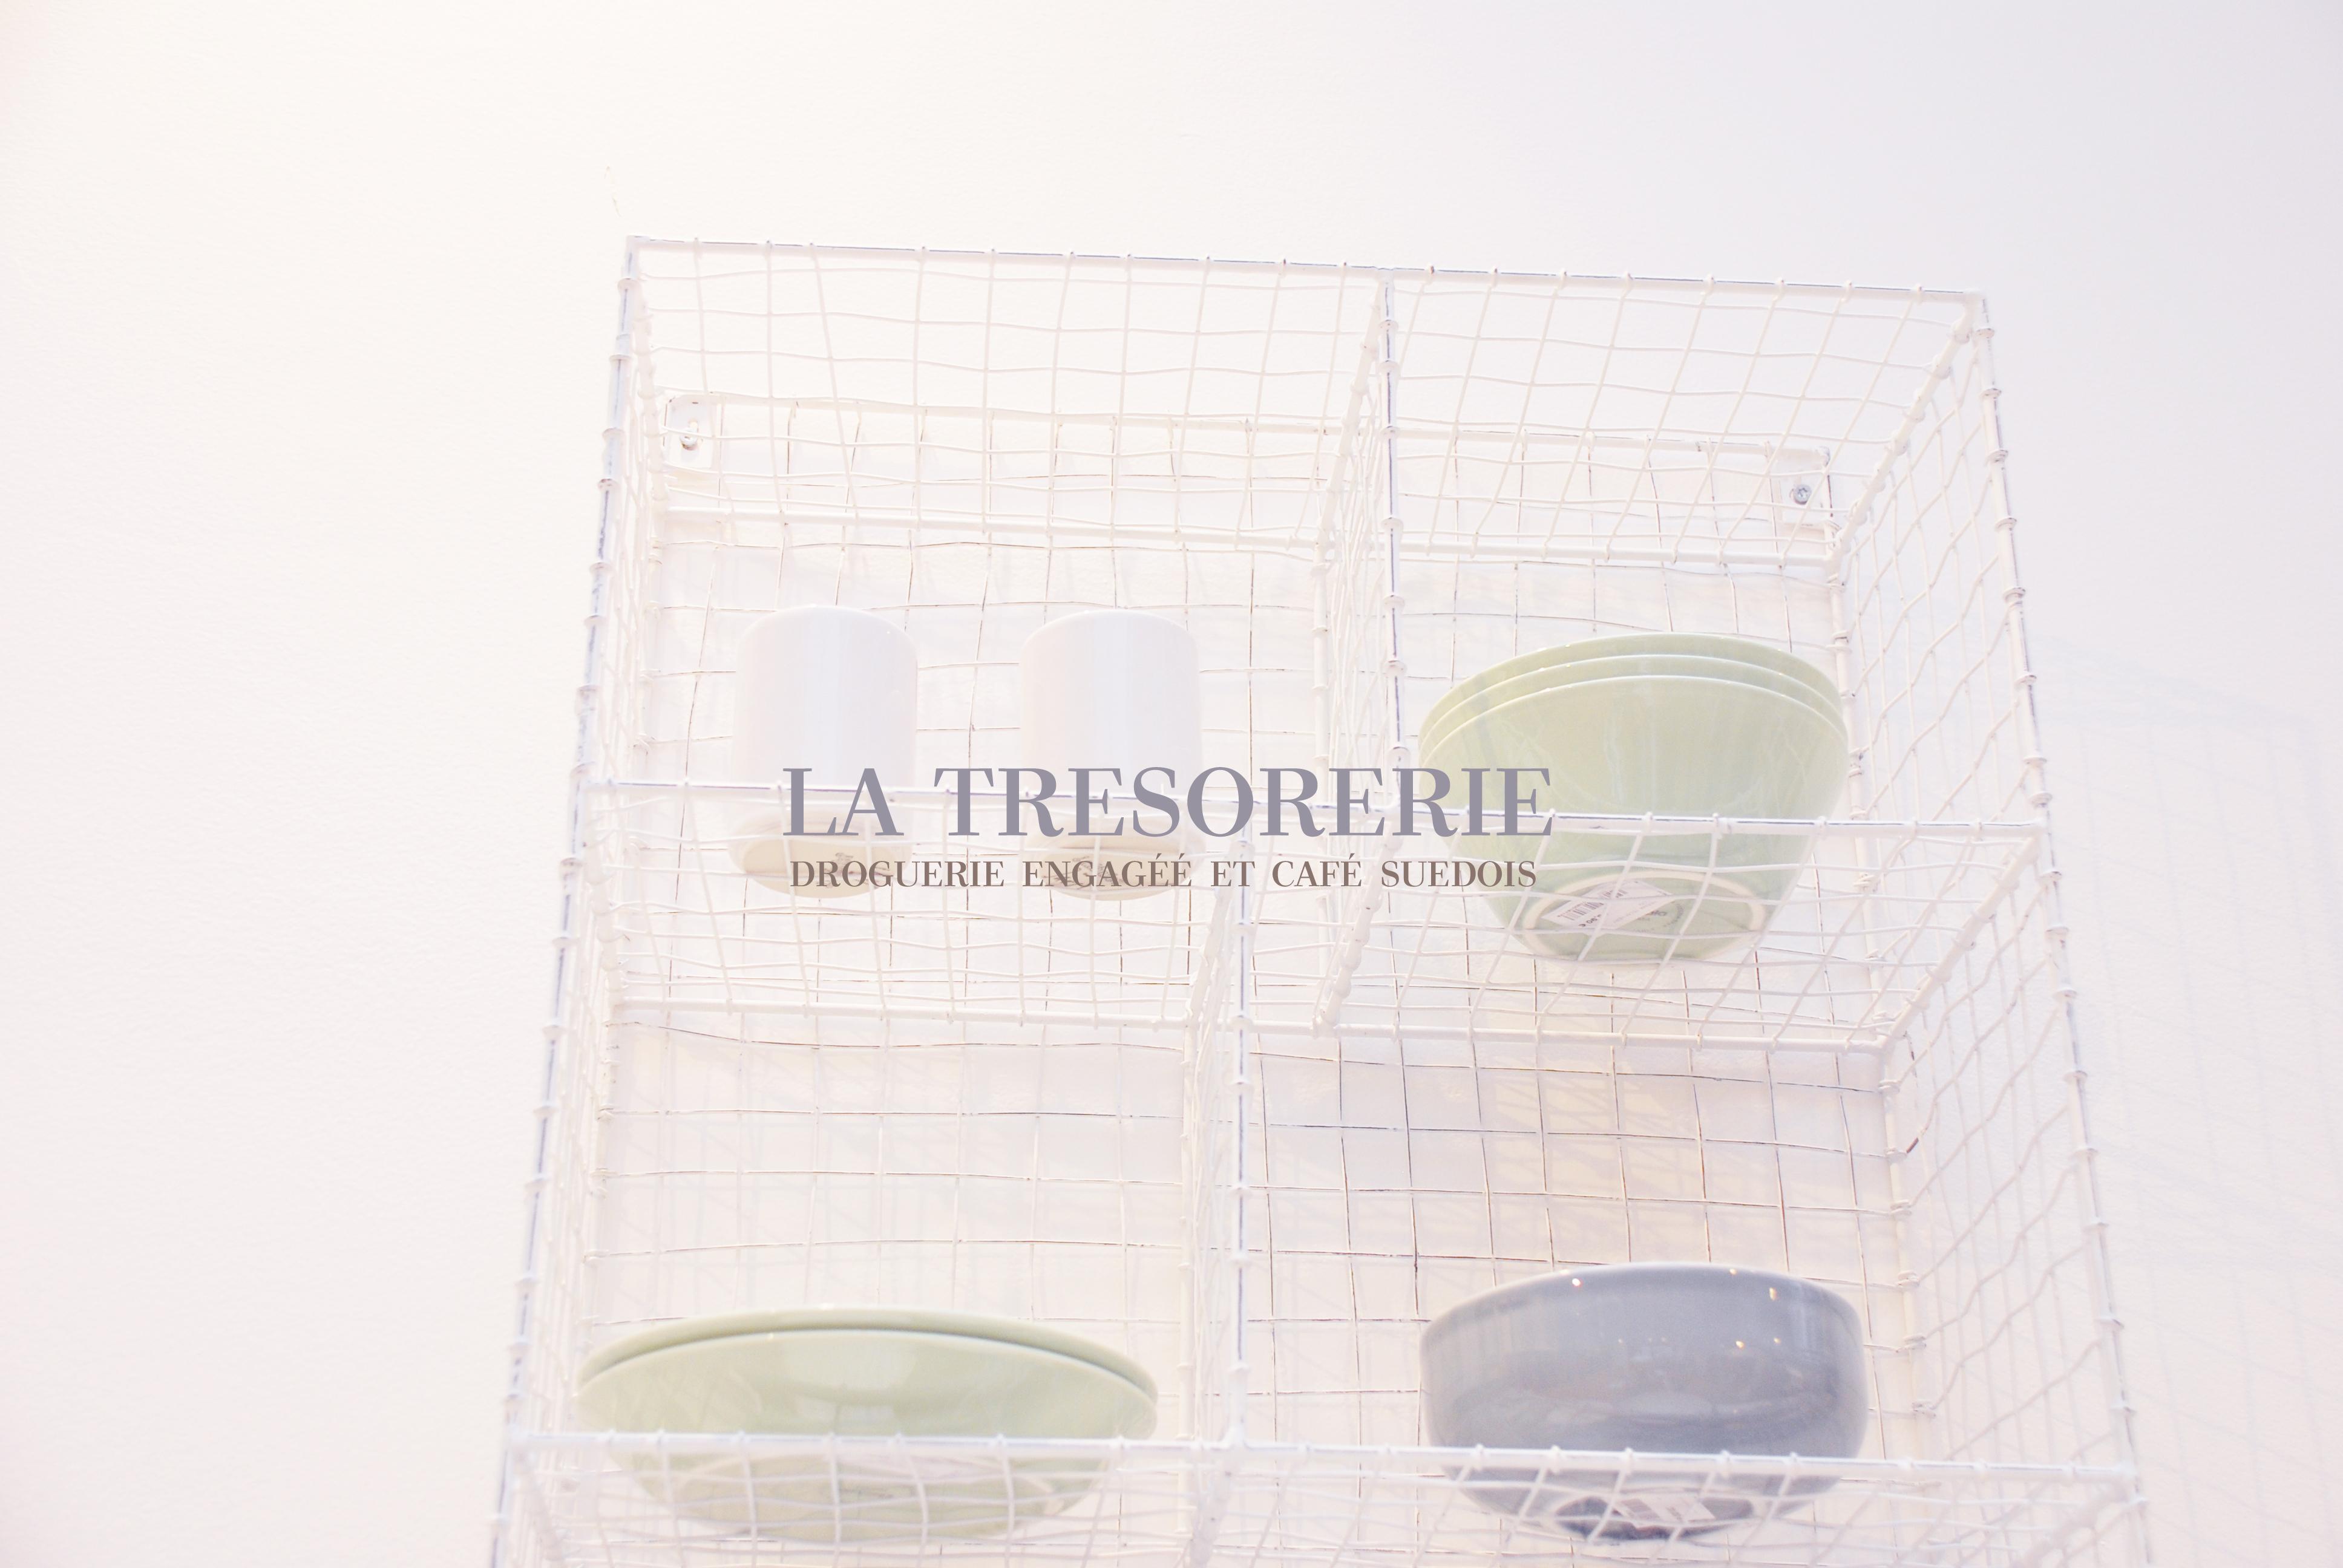 la-tresorerie-paris-10-bazar-droguerie-café-smorgas-by-le-polyedre_visuel